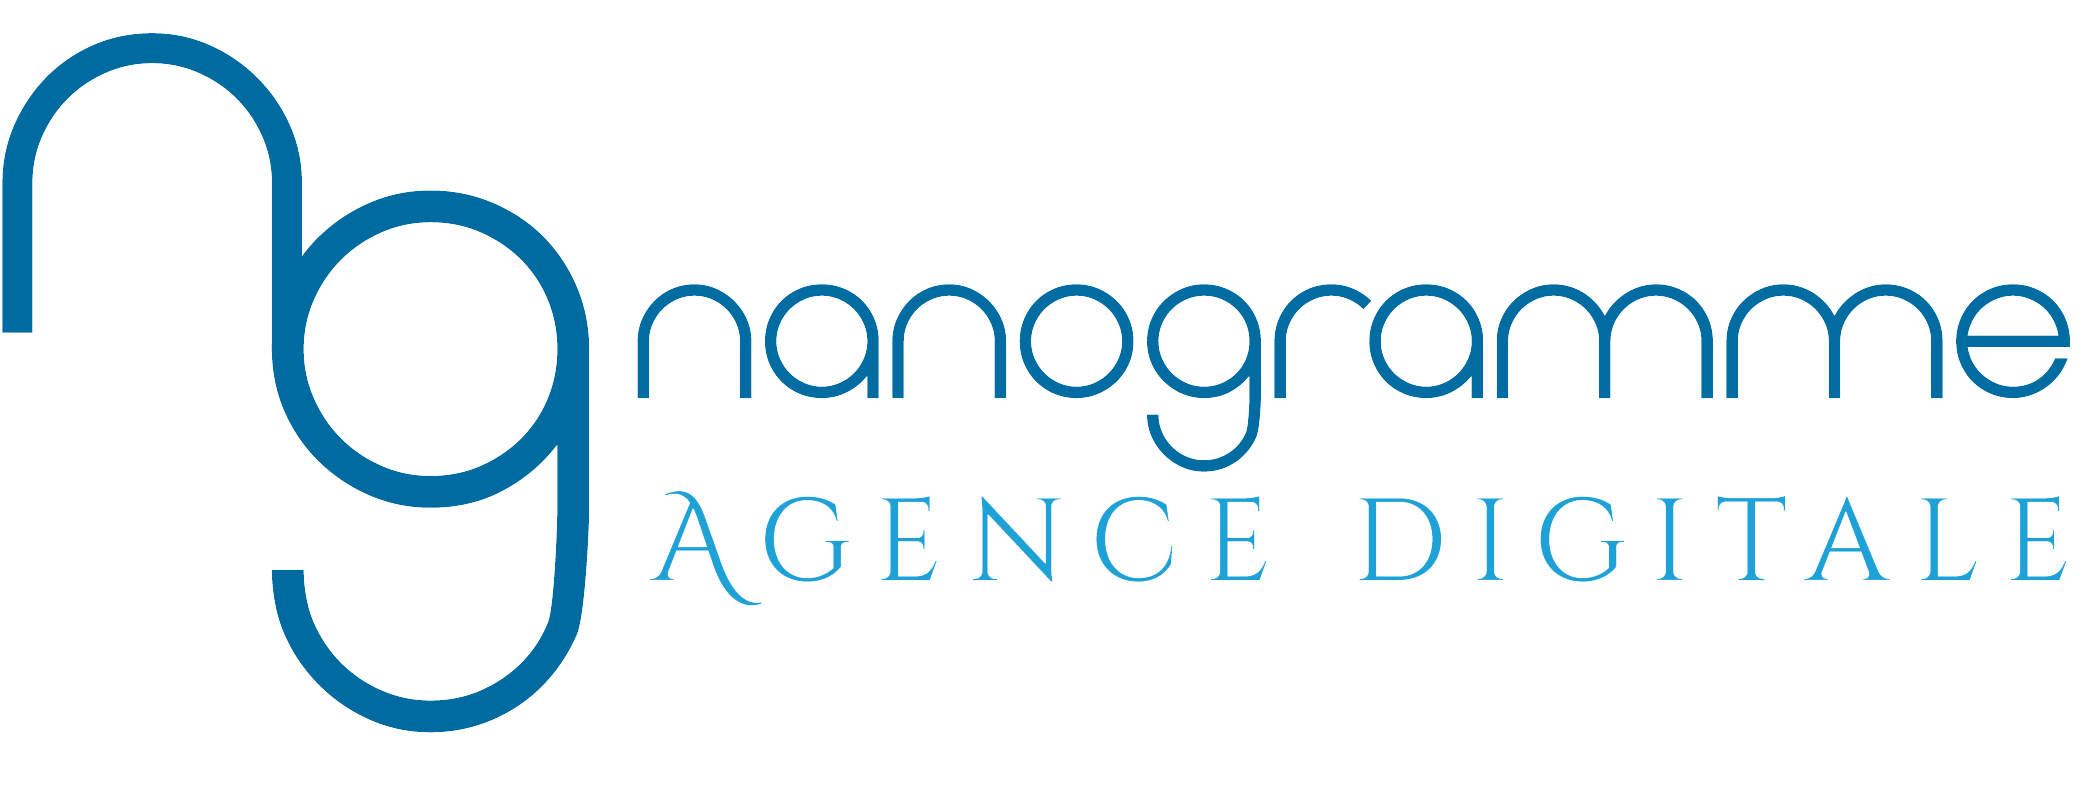 logo bleu nanogramme transparent